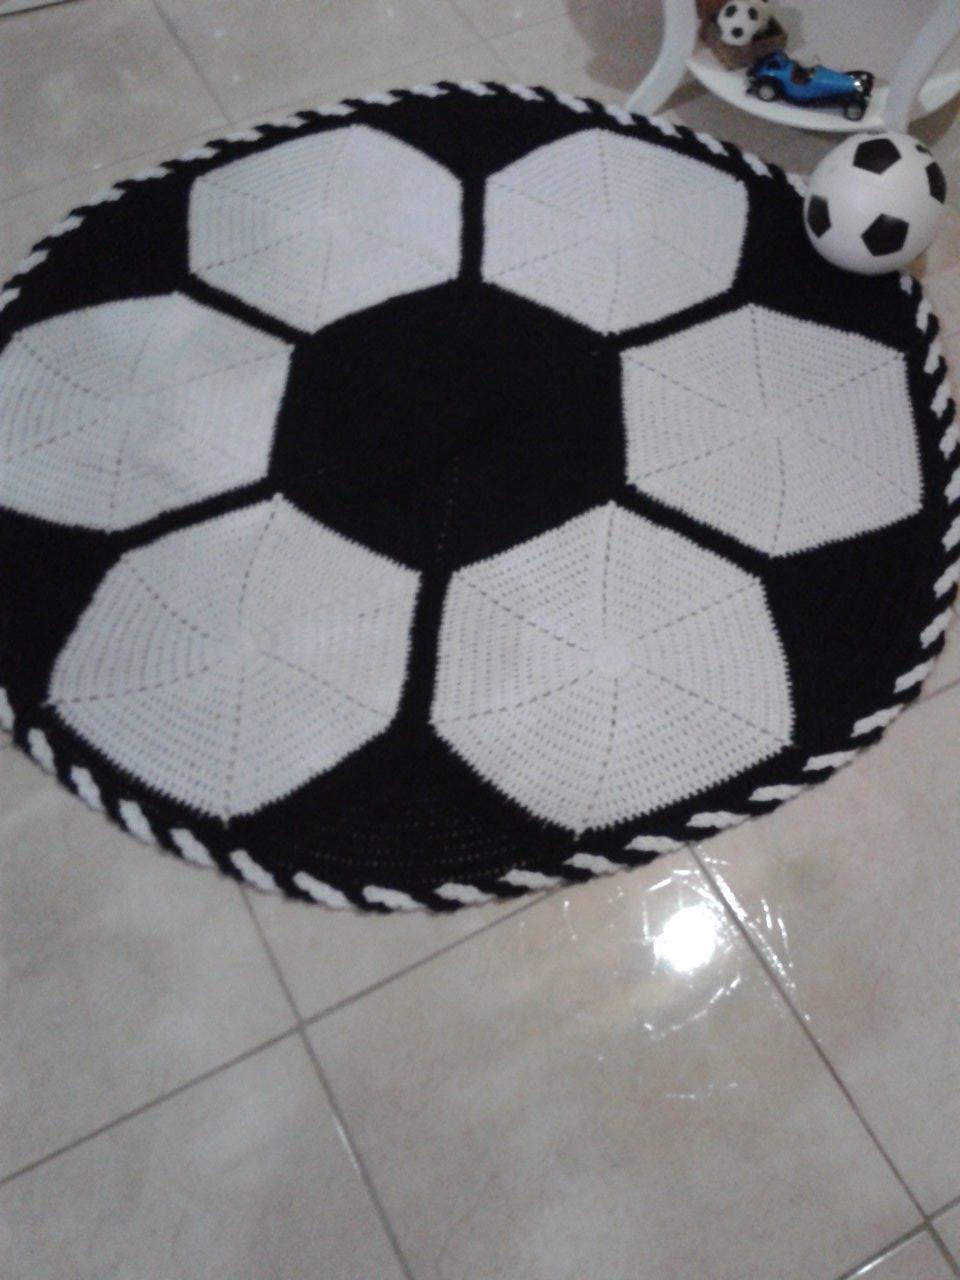 bdd969f56 Tapete Bola de Futebol